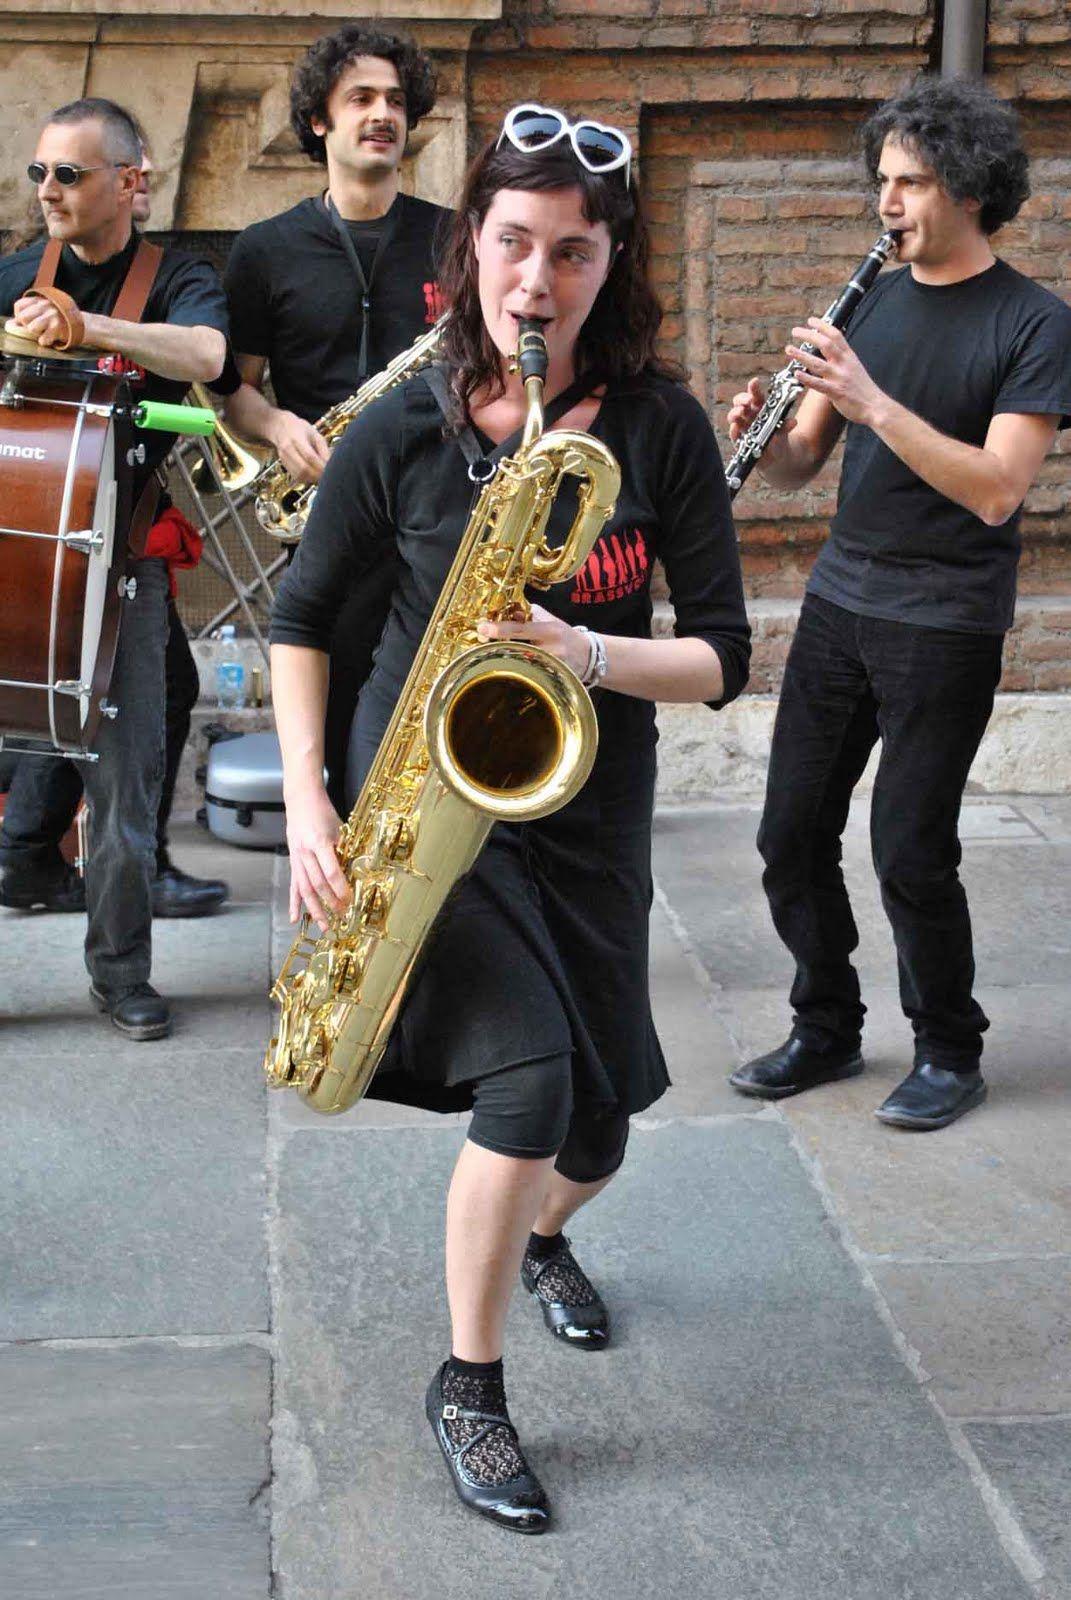 Una band in strada